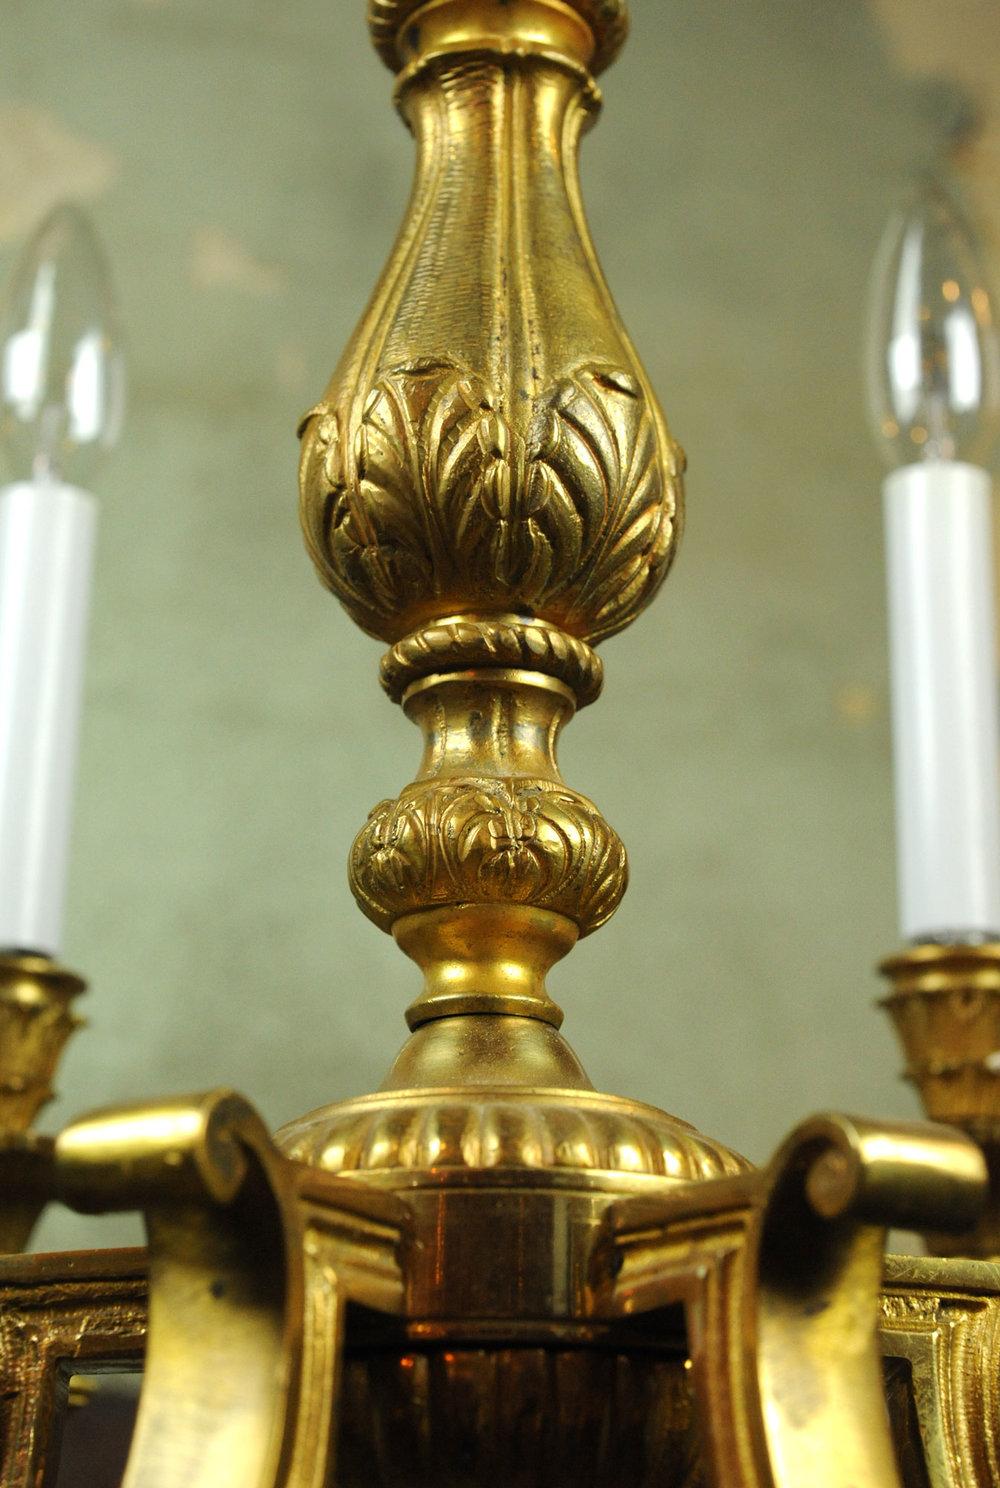 46926-brass-chandelier-detail.jpg